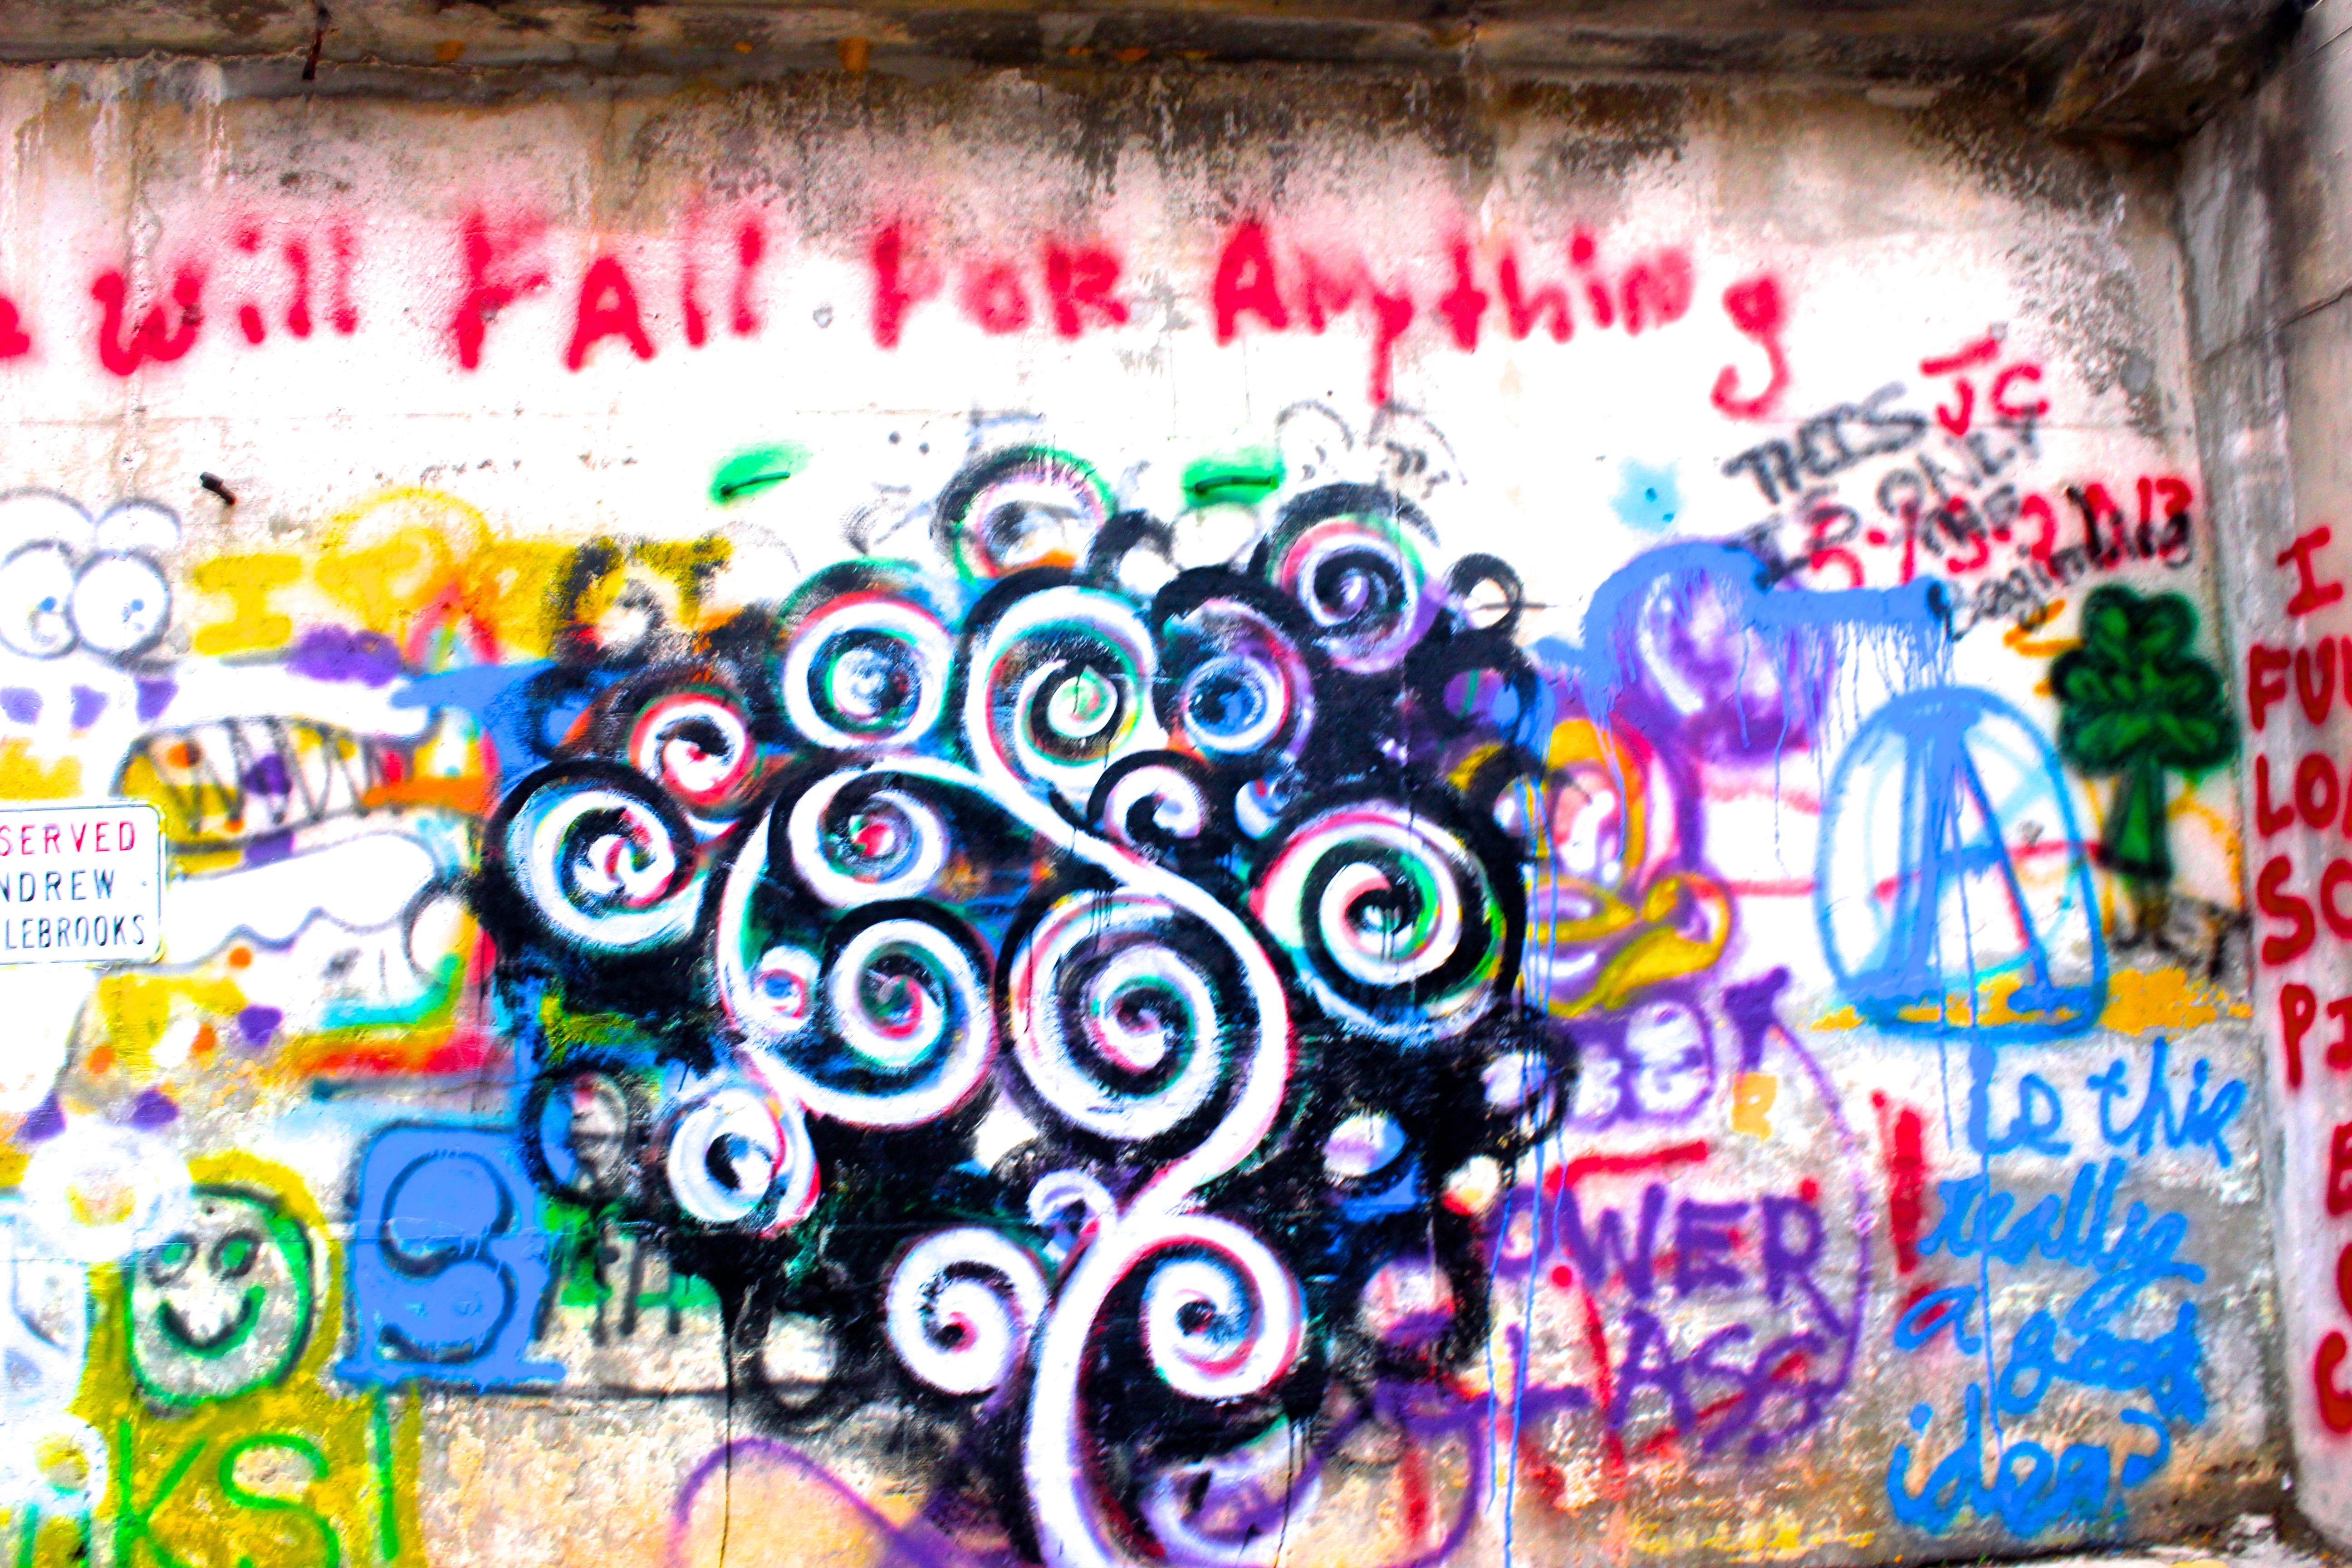 graffiti wall art street art tags pinterest. Black Bedroom Furniture Sets. Home Design Ideas